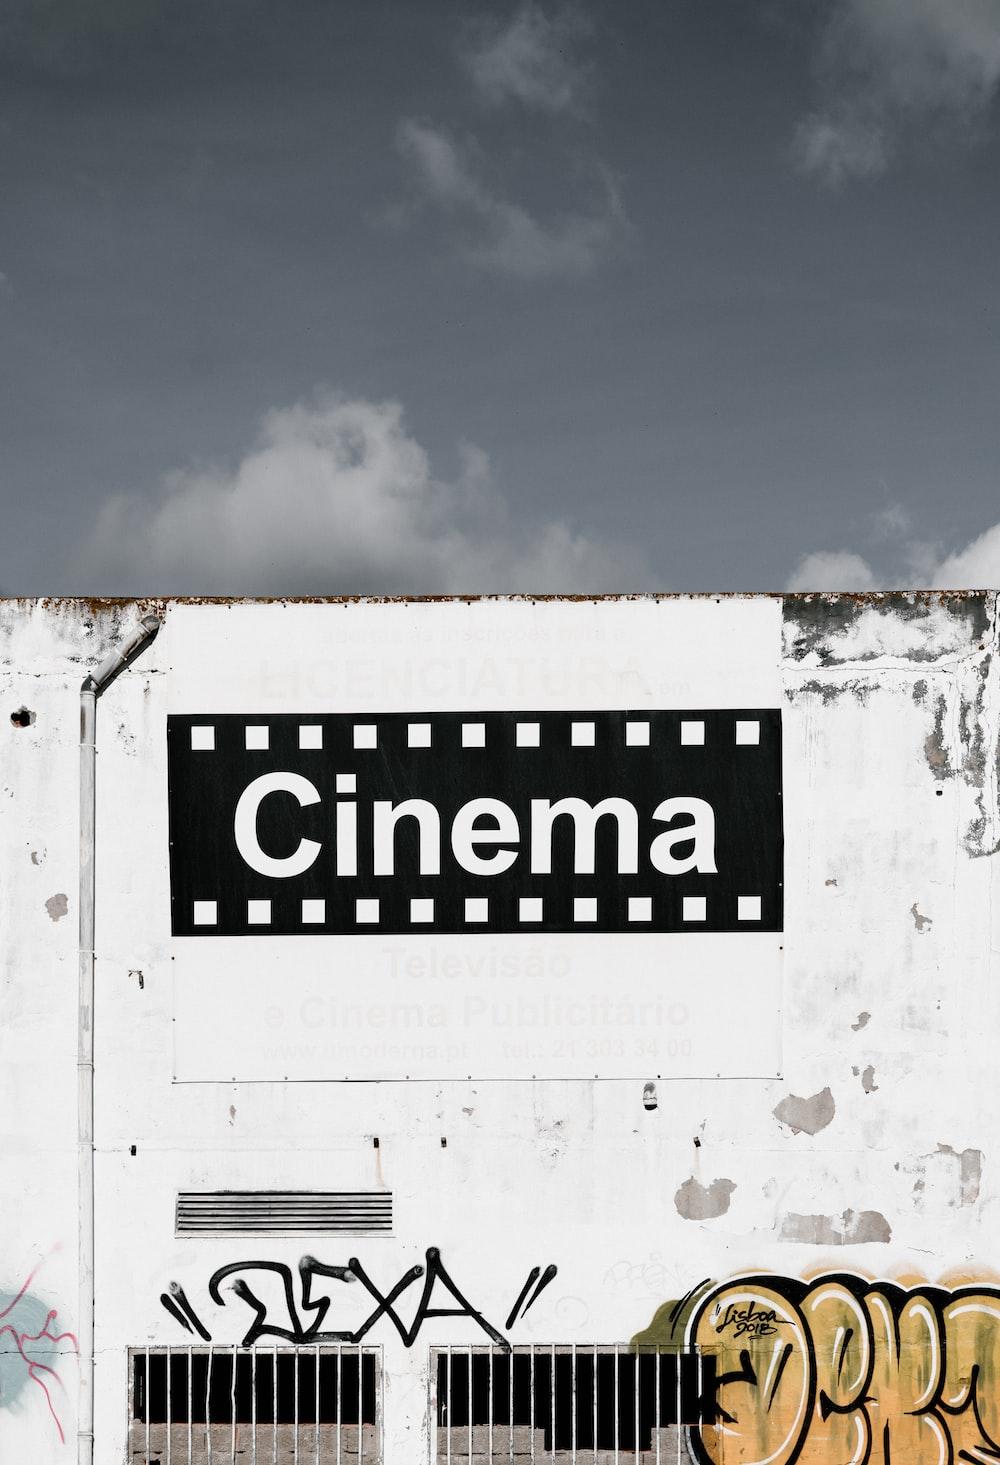 black and white Cinema graffiti